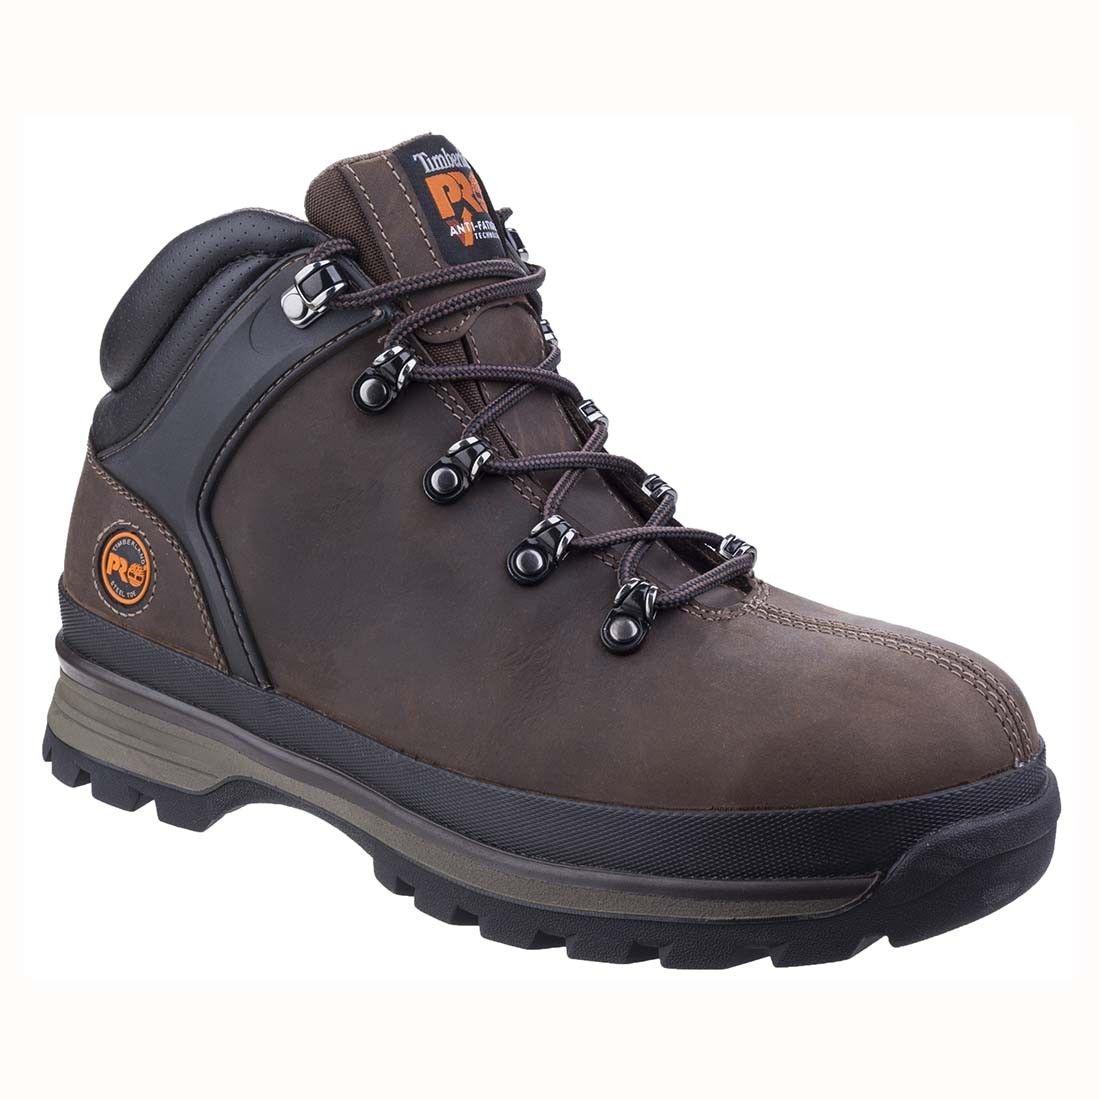 Timberland Pro S3 Gaucho Leather Splitrock XT Unisex Hiker